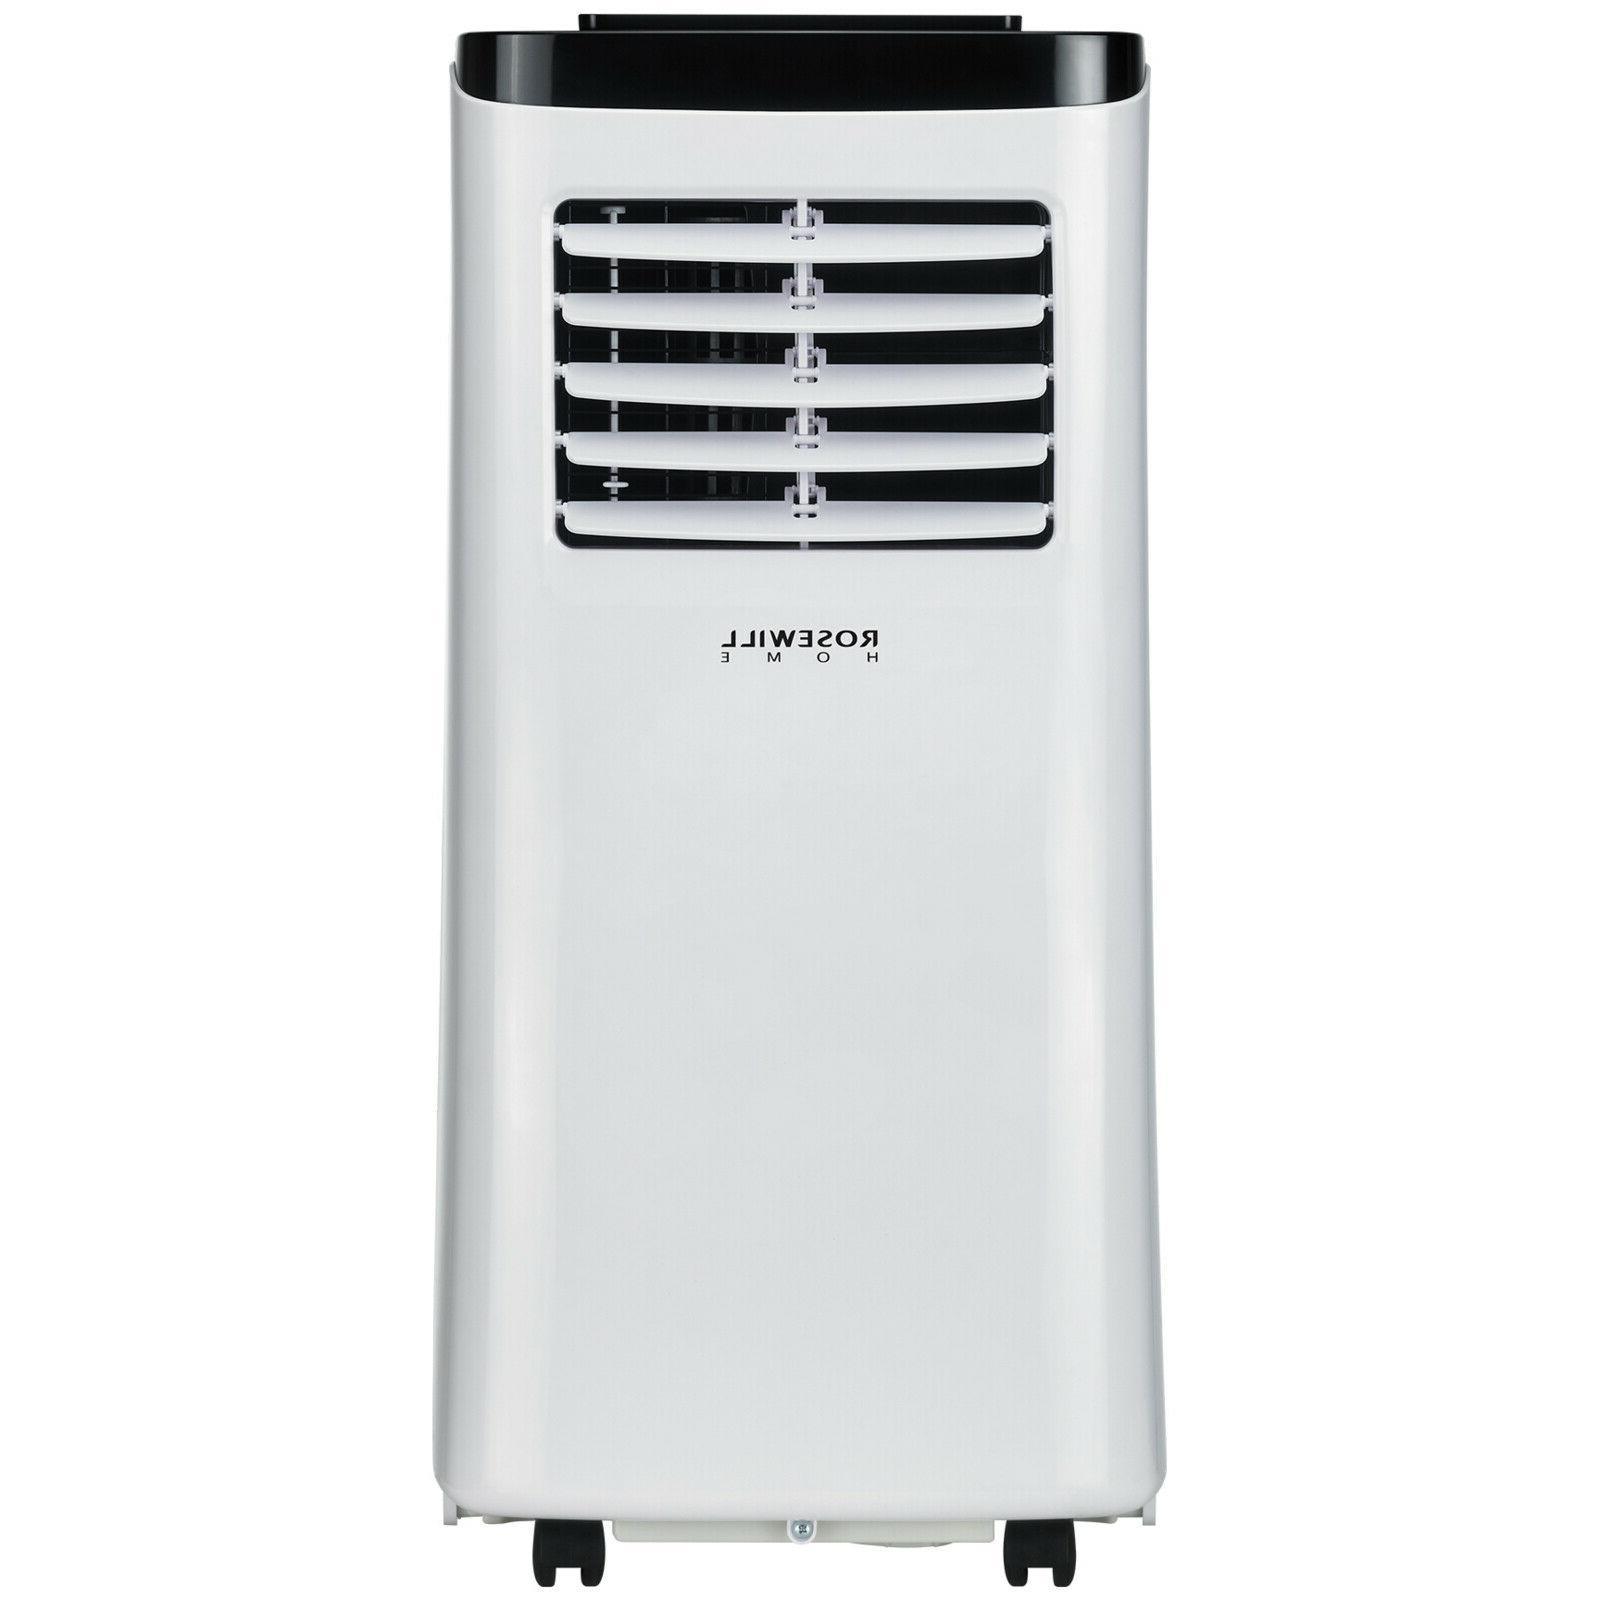 8000 btu portable air conditioner and dehumidifier